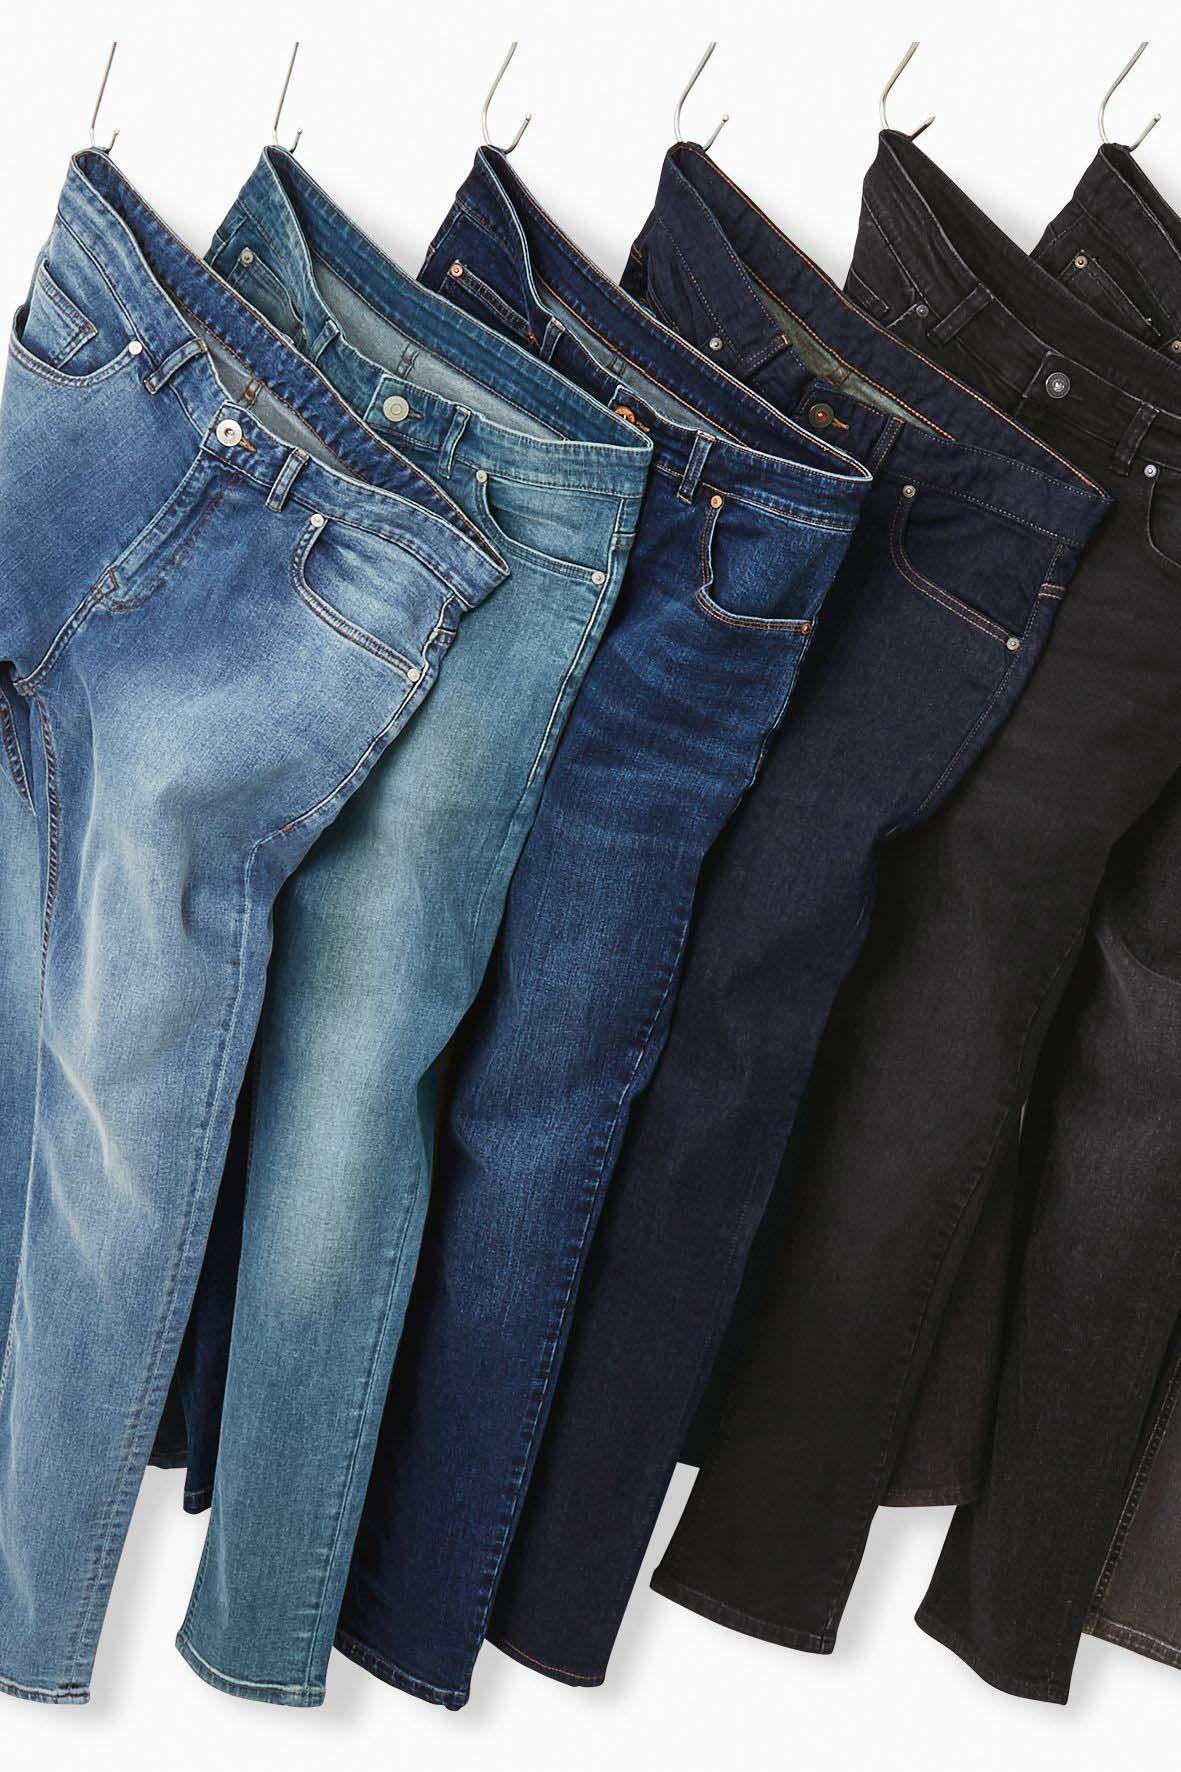 next mens denim stretch jeans slim fit